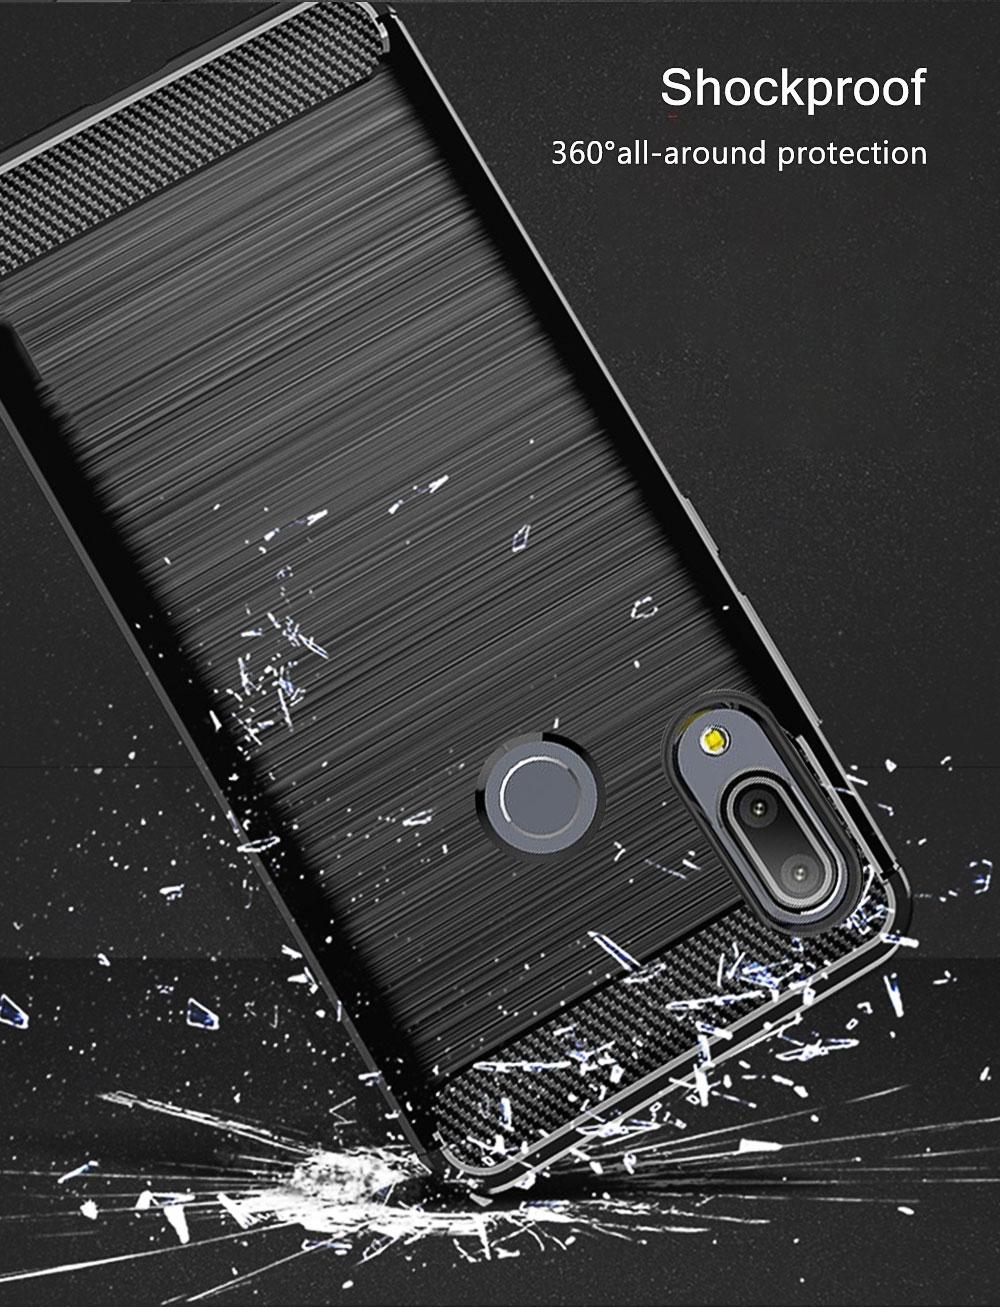 Zenfone-Max-Pro(M1)_11